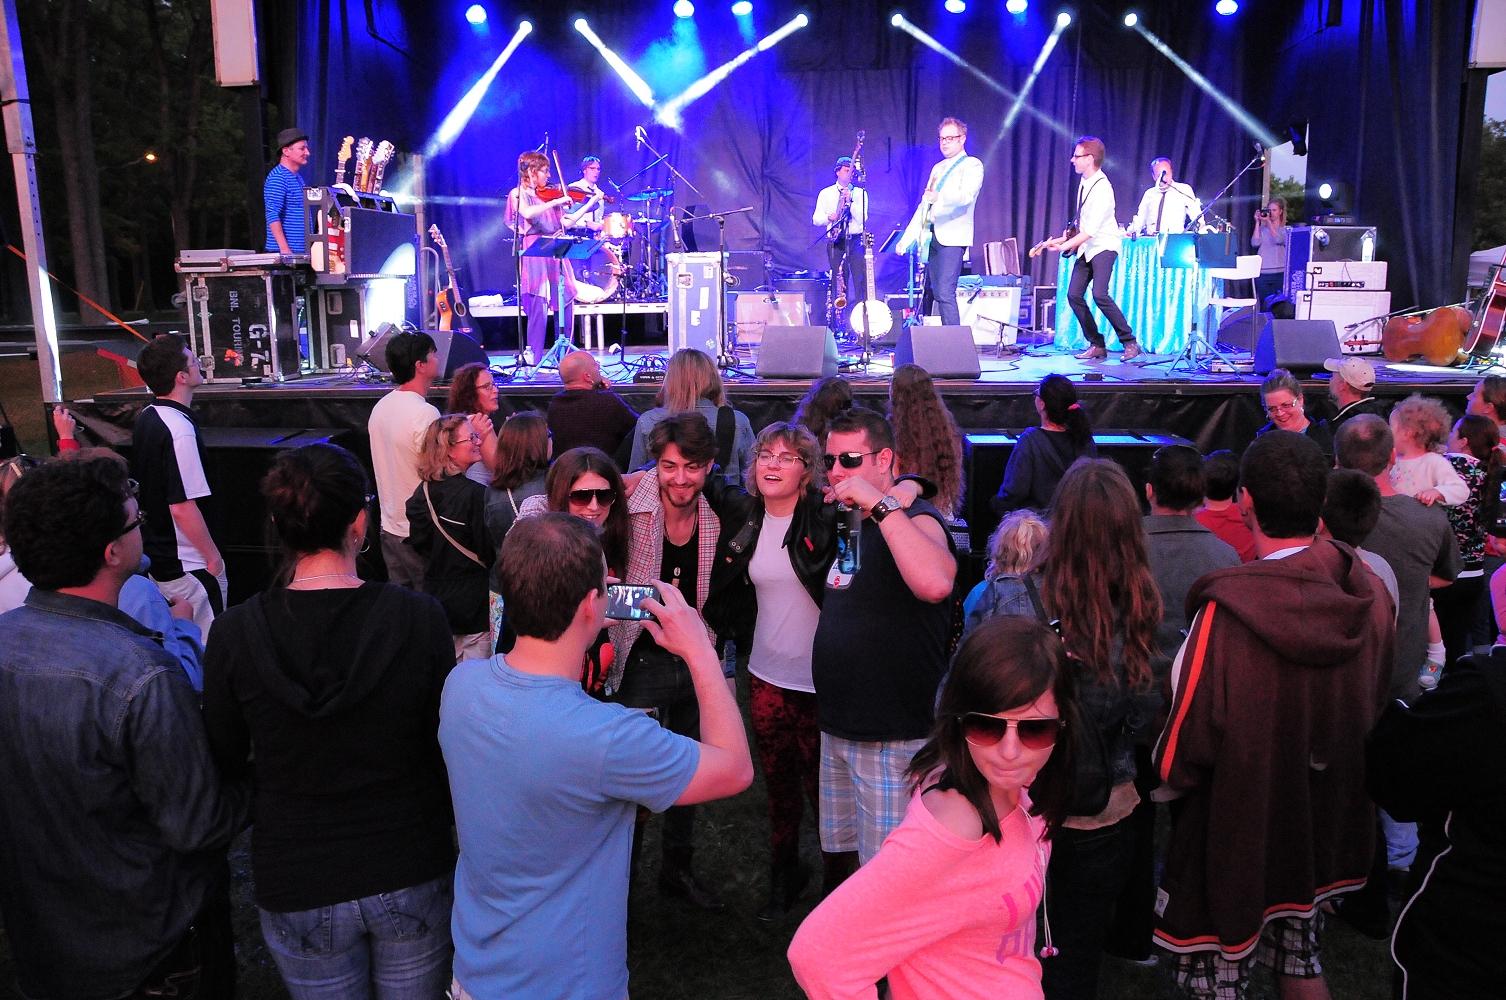 Concert In Canatara